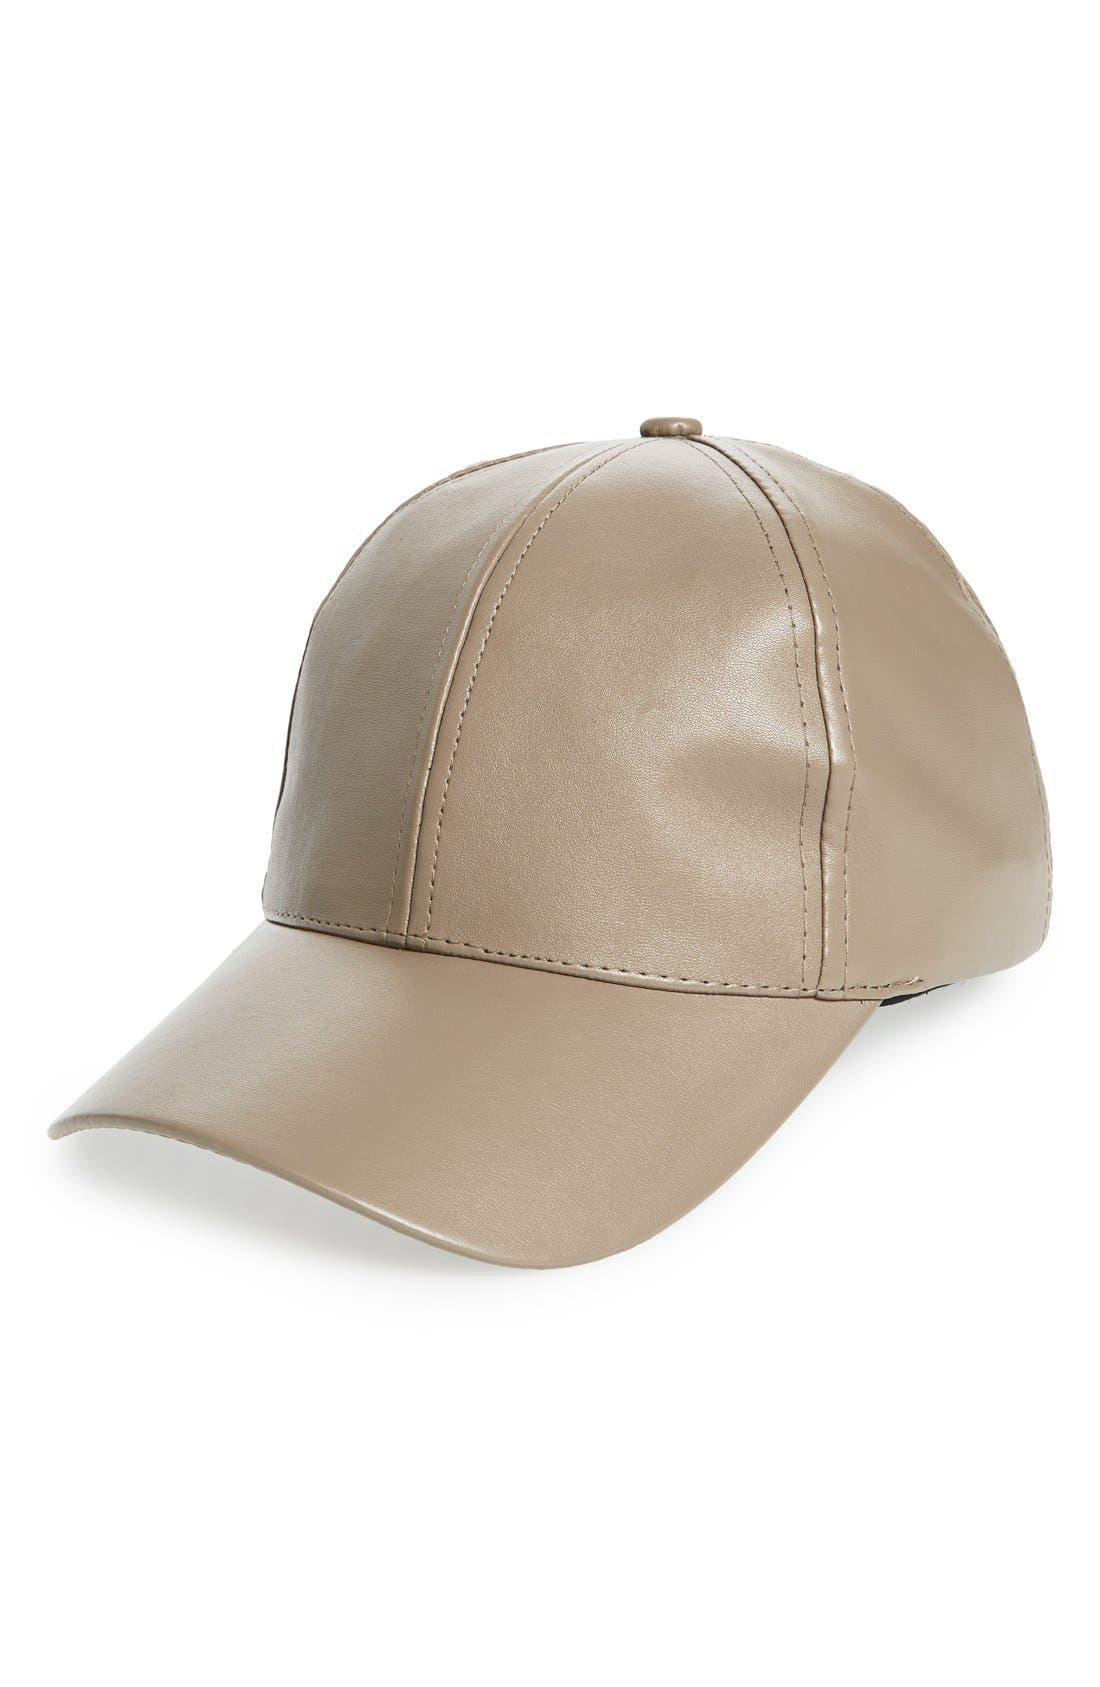 Alternate Image 1 Selected - Phase 3 Baseball Cap